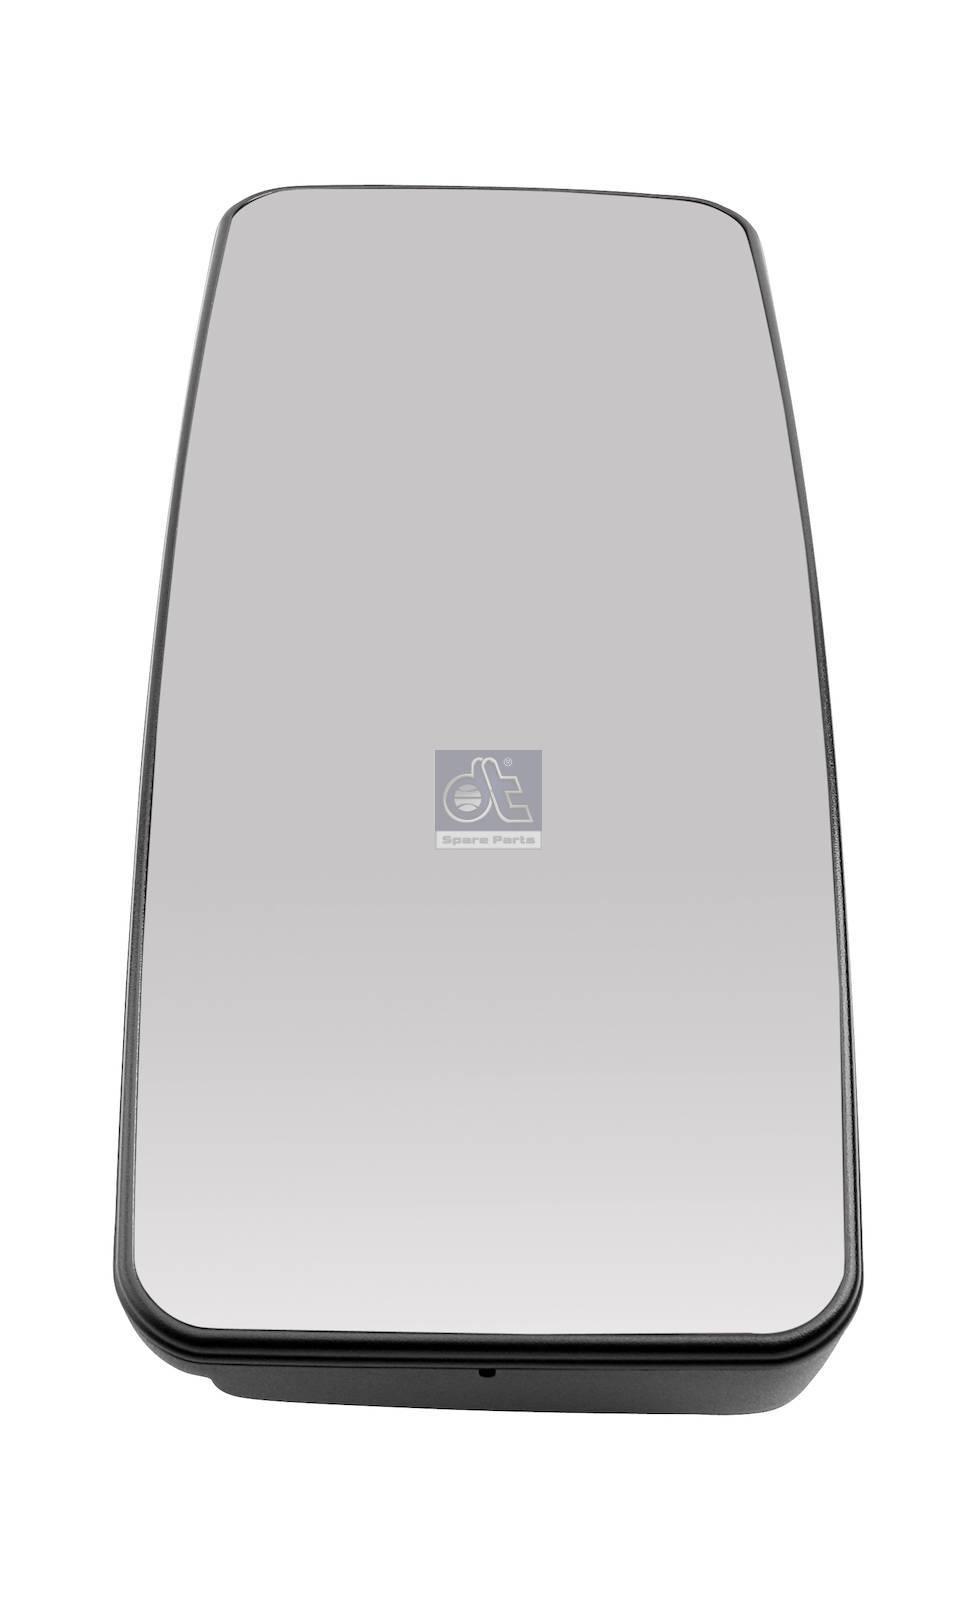 Main mirror, heated, electrical